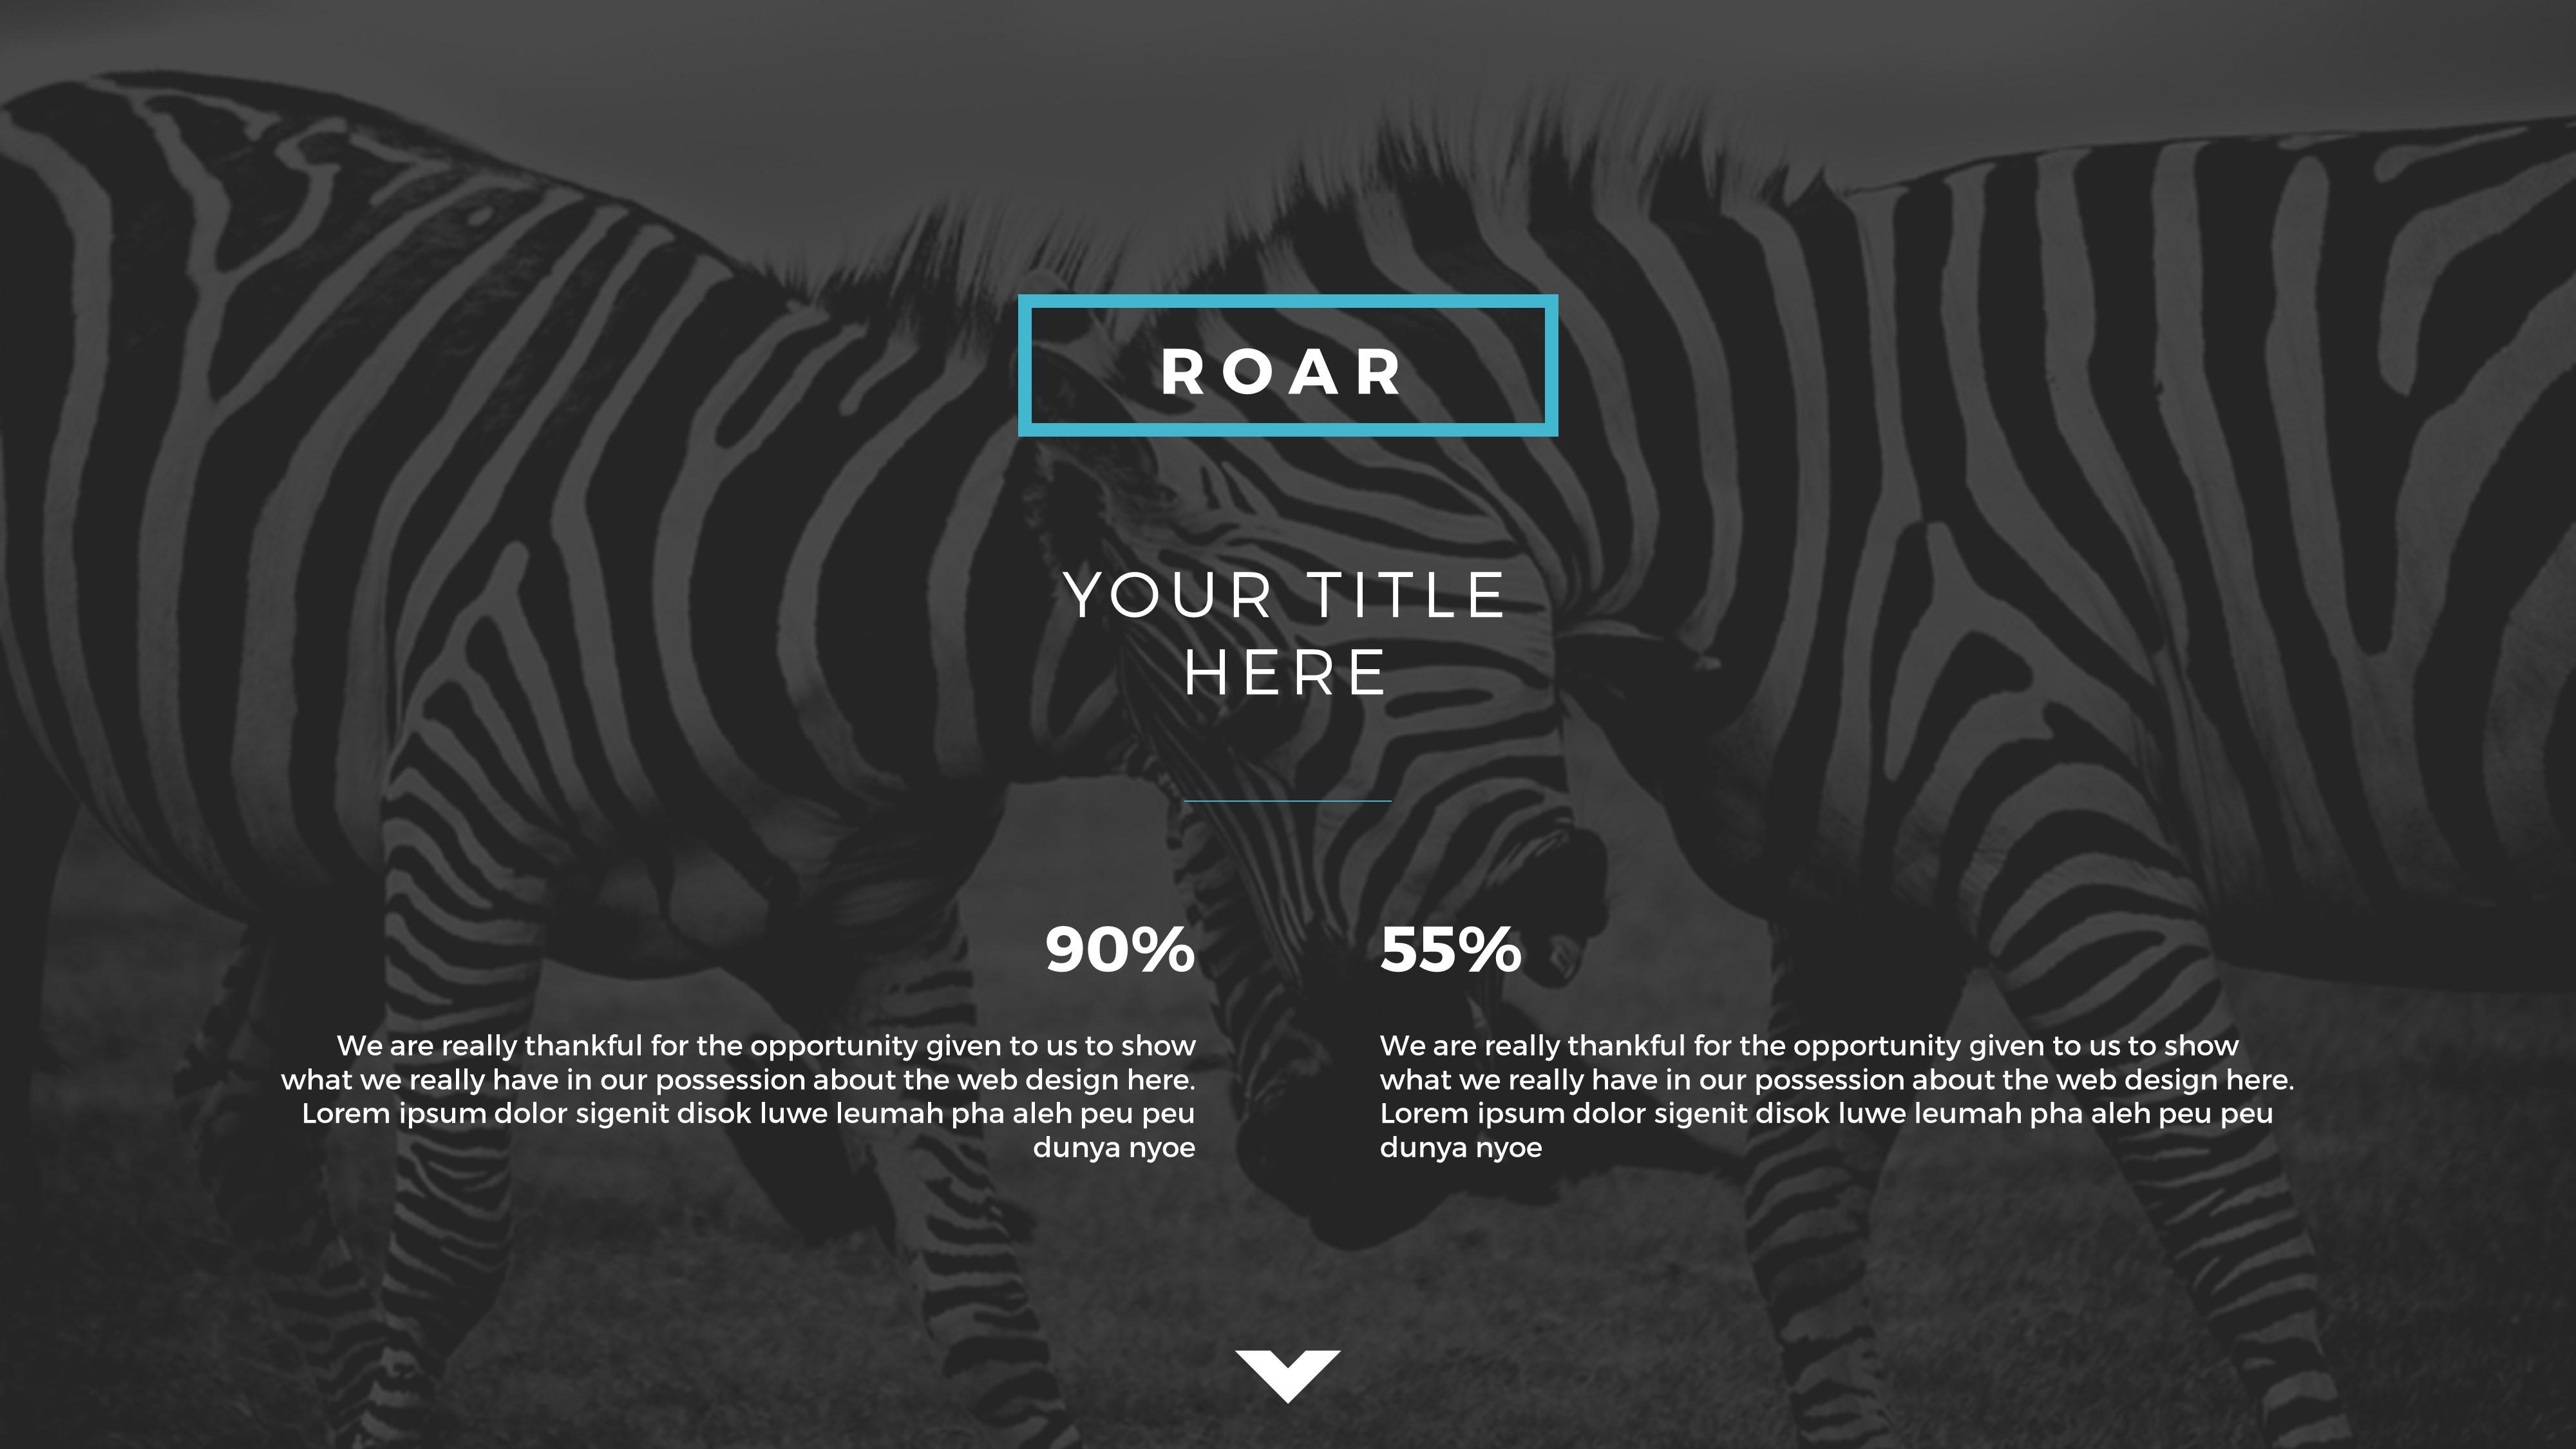 Roar presentation template by brandearth graphicriver jpg preview image setslide34 toneelgroepblik Choice Image